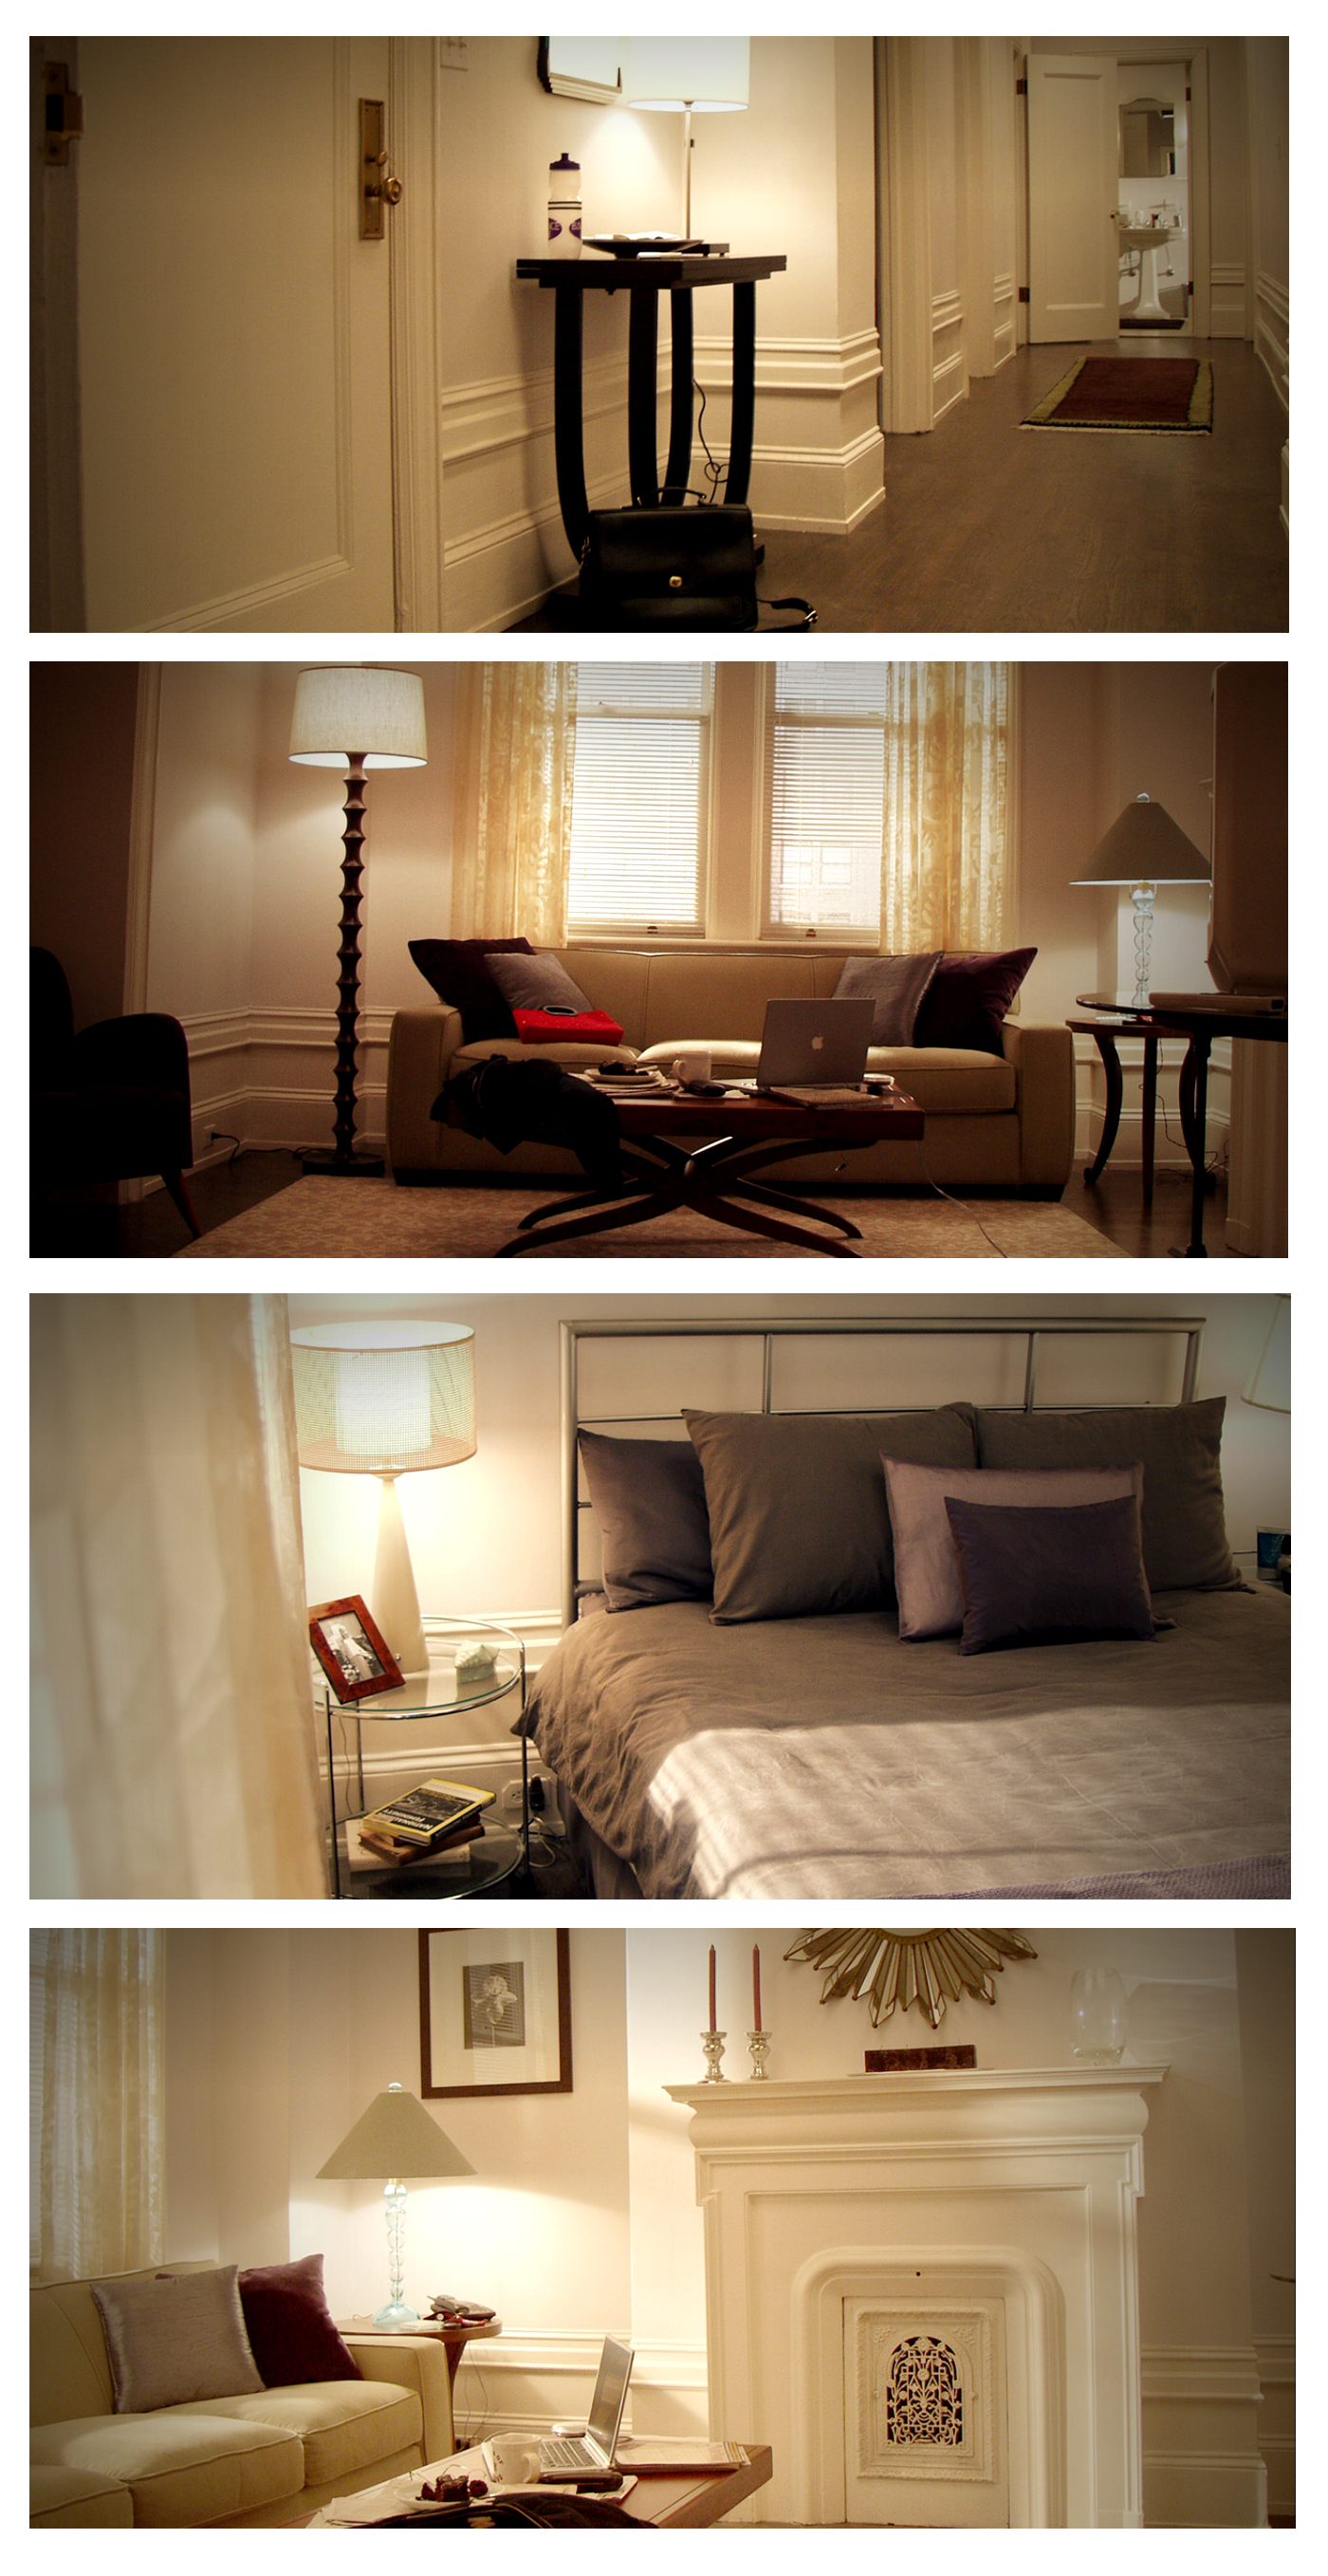 Aparatment Living Room Ideas